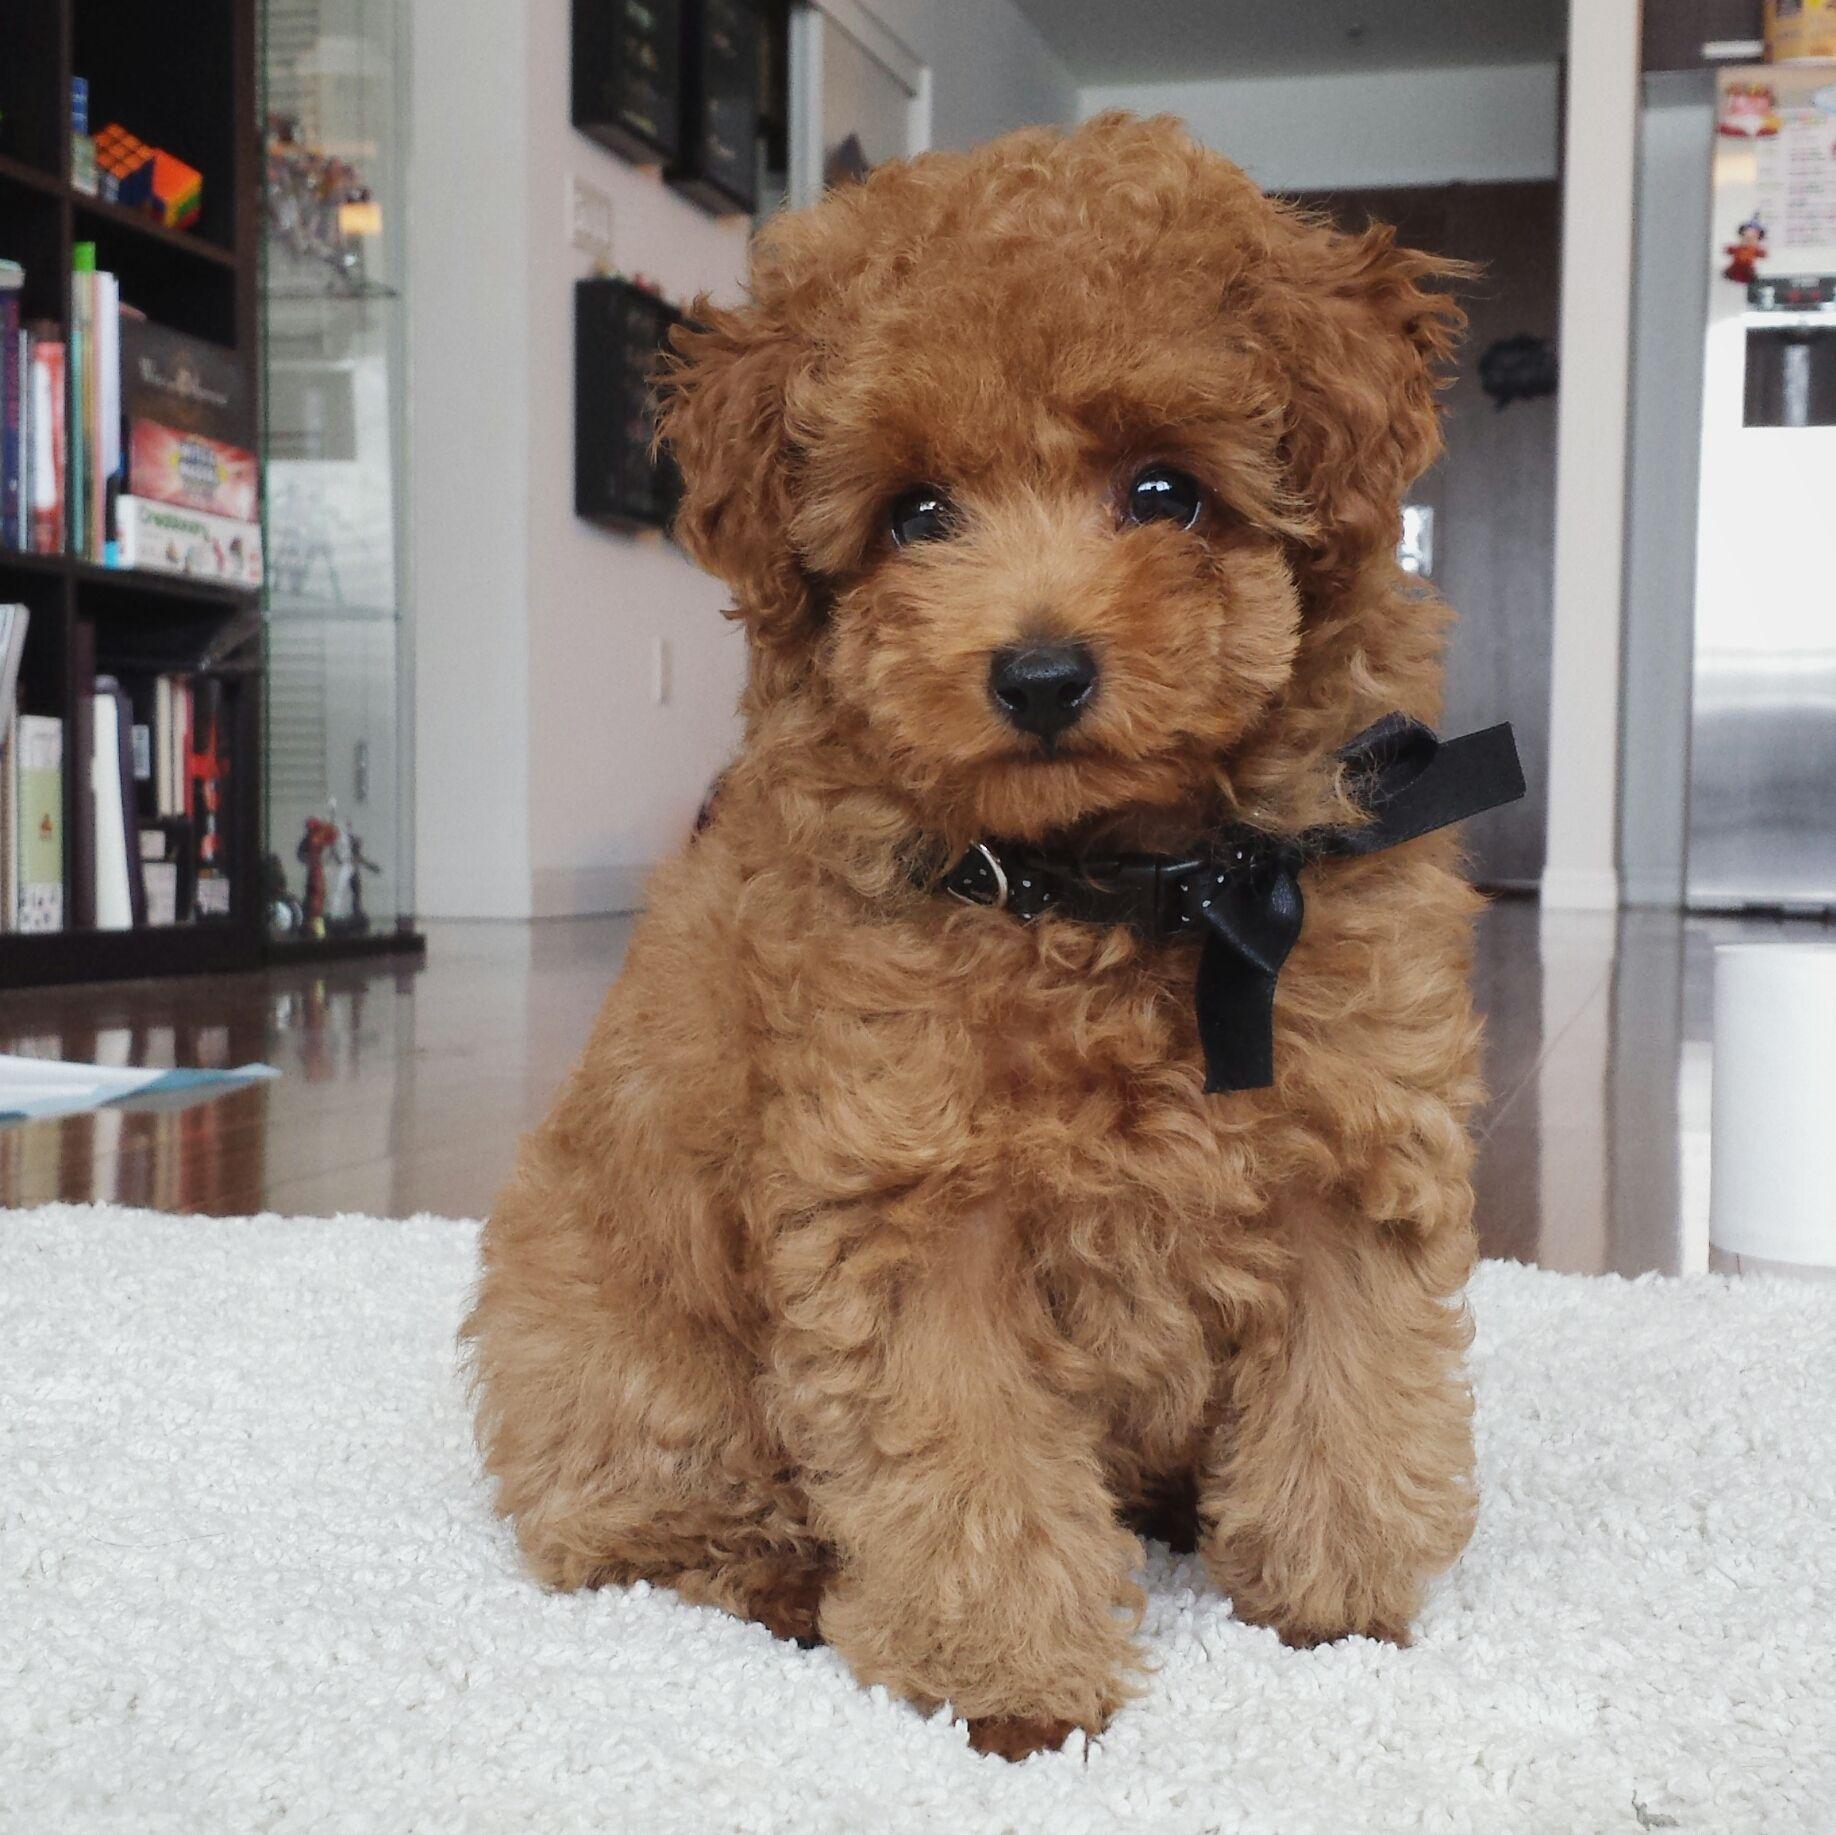 Akc show quality champion bloodline maltipoo puppy